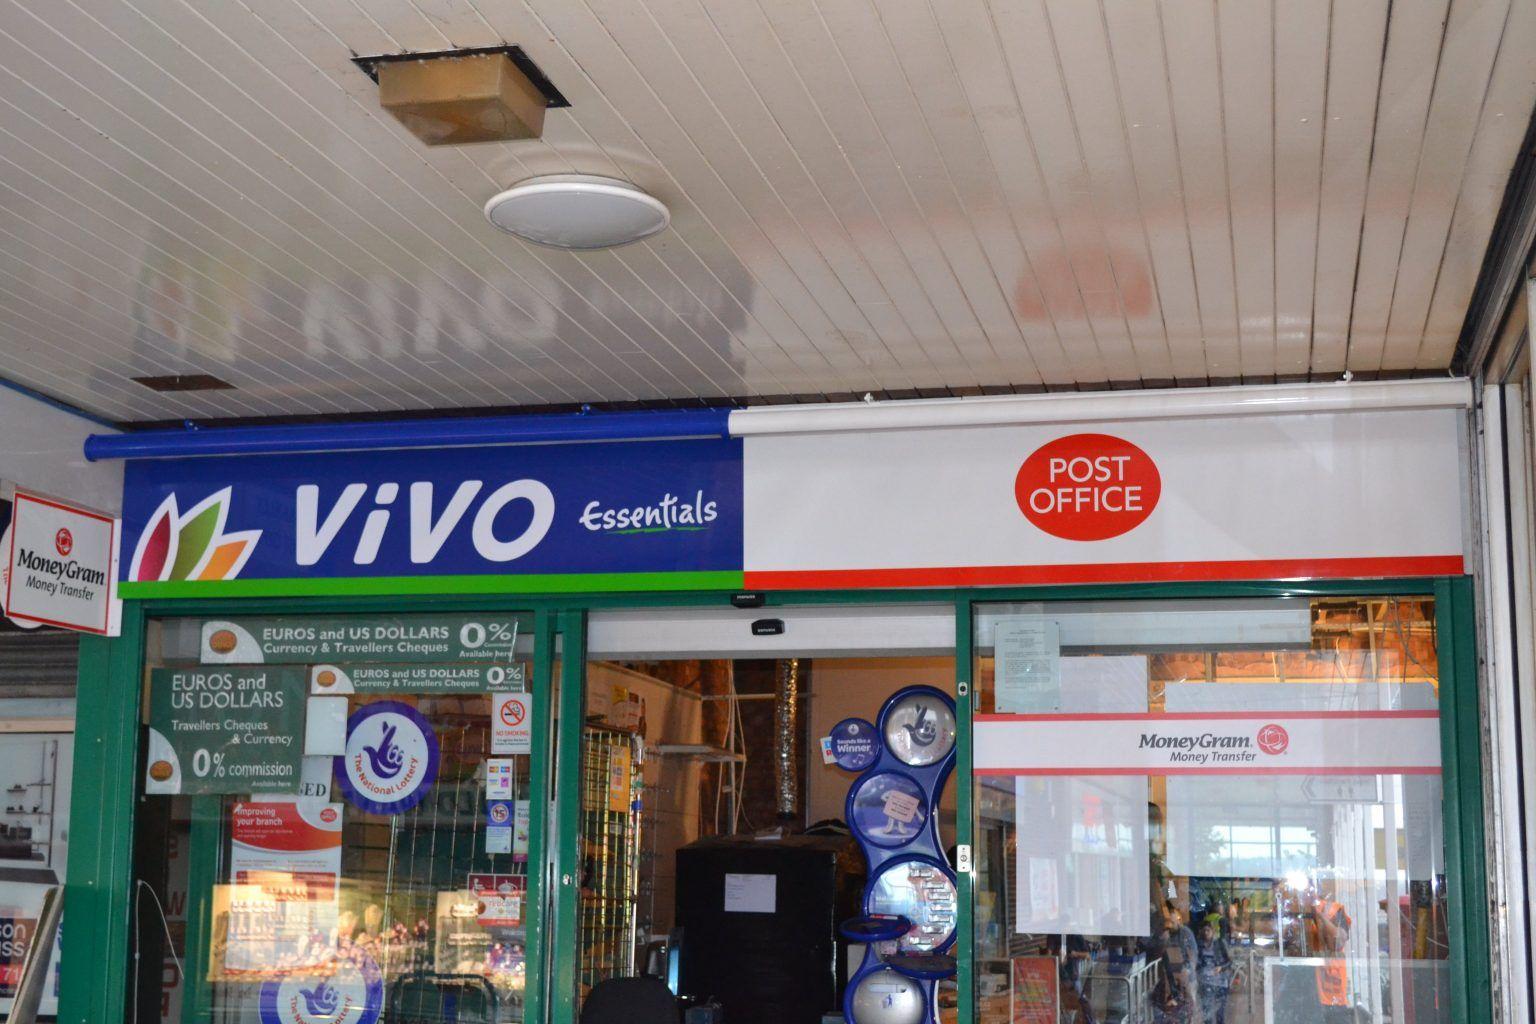 VIVO & Post Office Fascia Sign